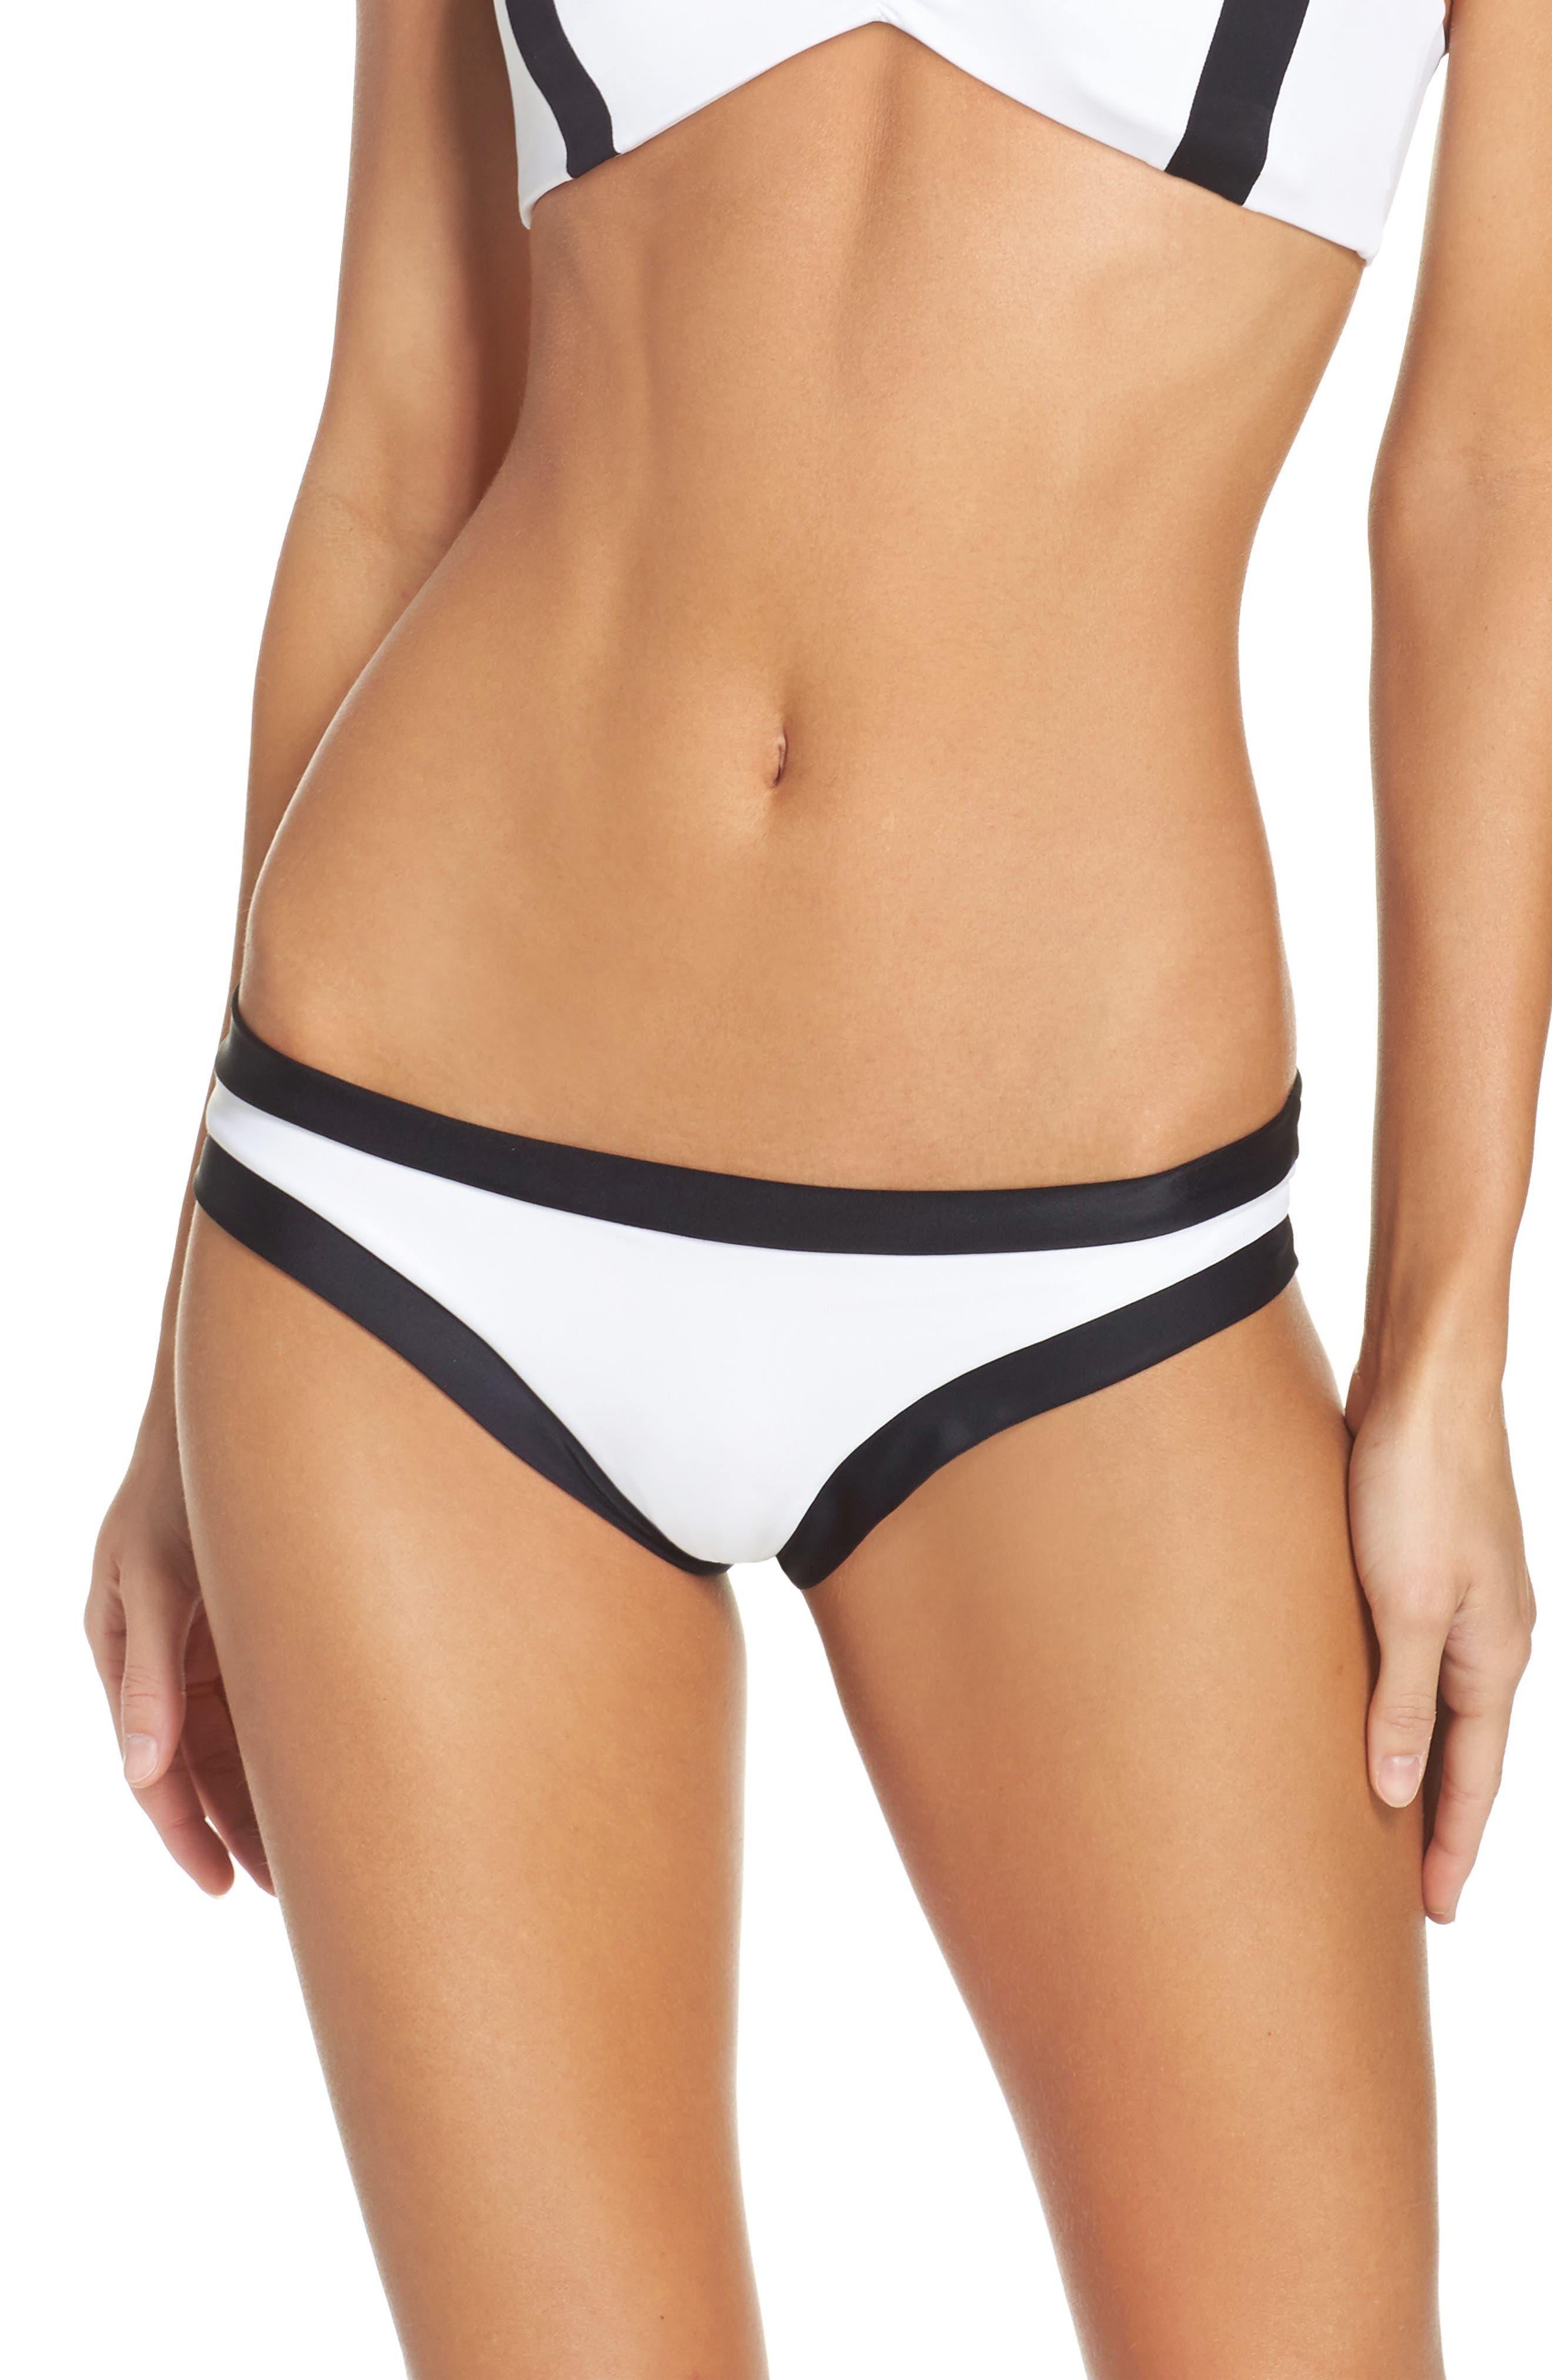 Main Image - PilyQ Sporty Teeny Bikini Bottoms